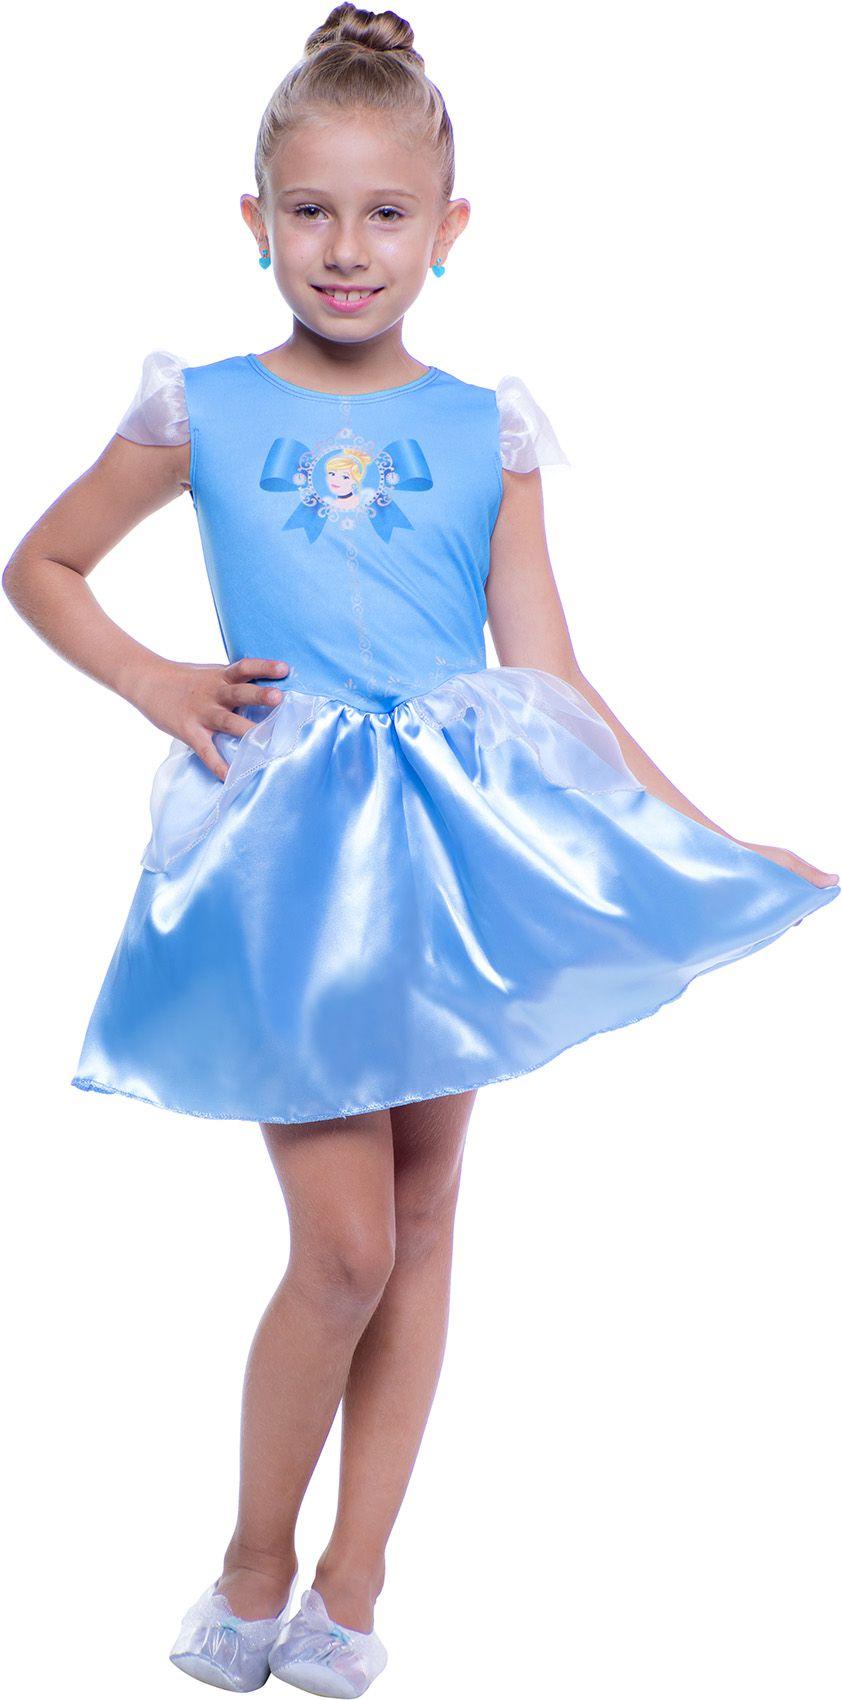 Fantasia Infantil Cinderela Pop Princesas Disney